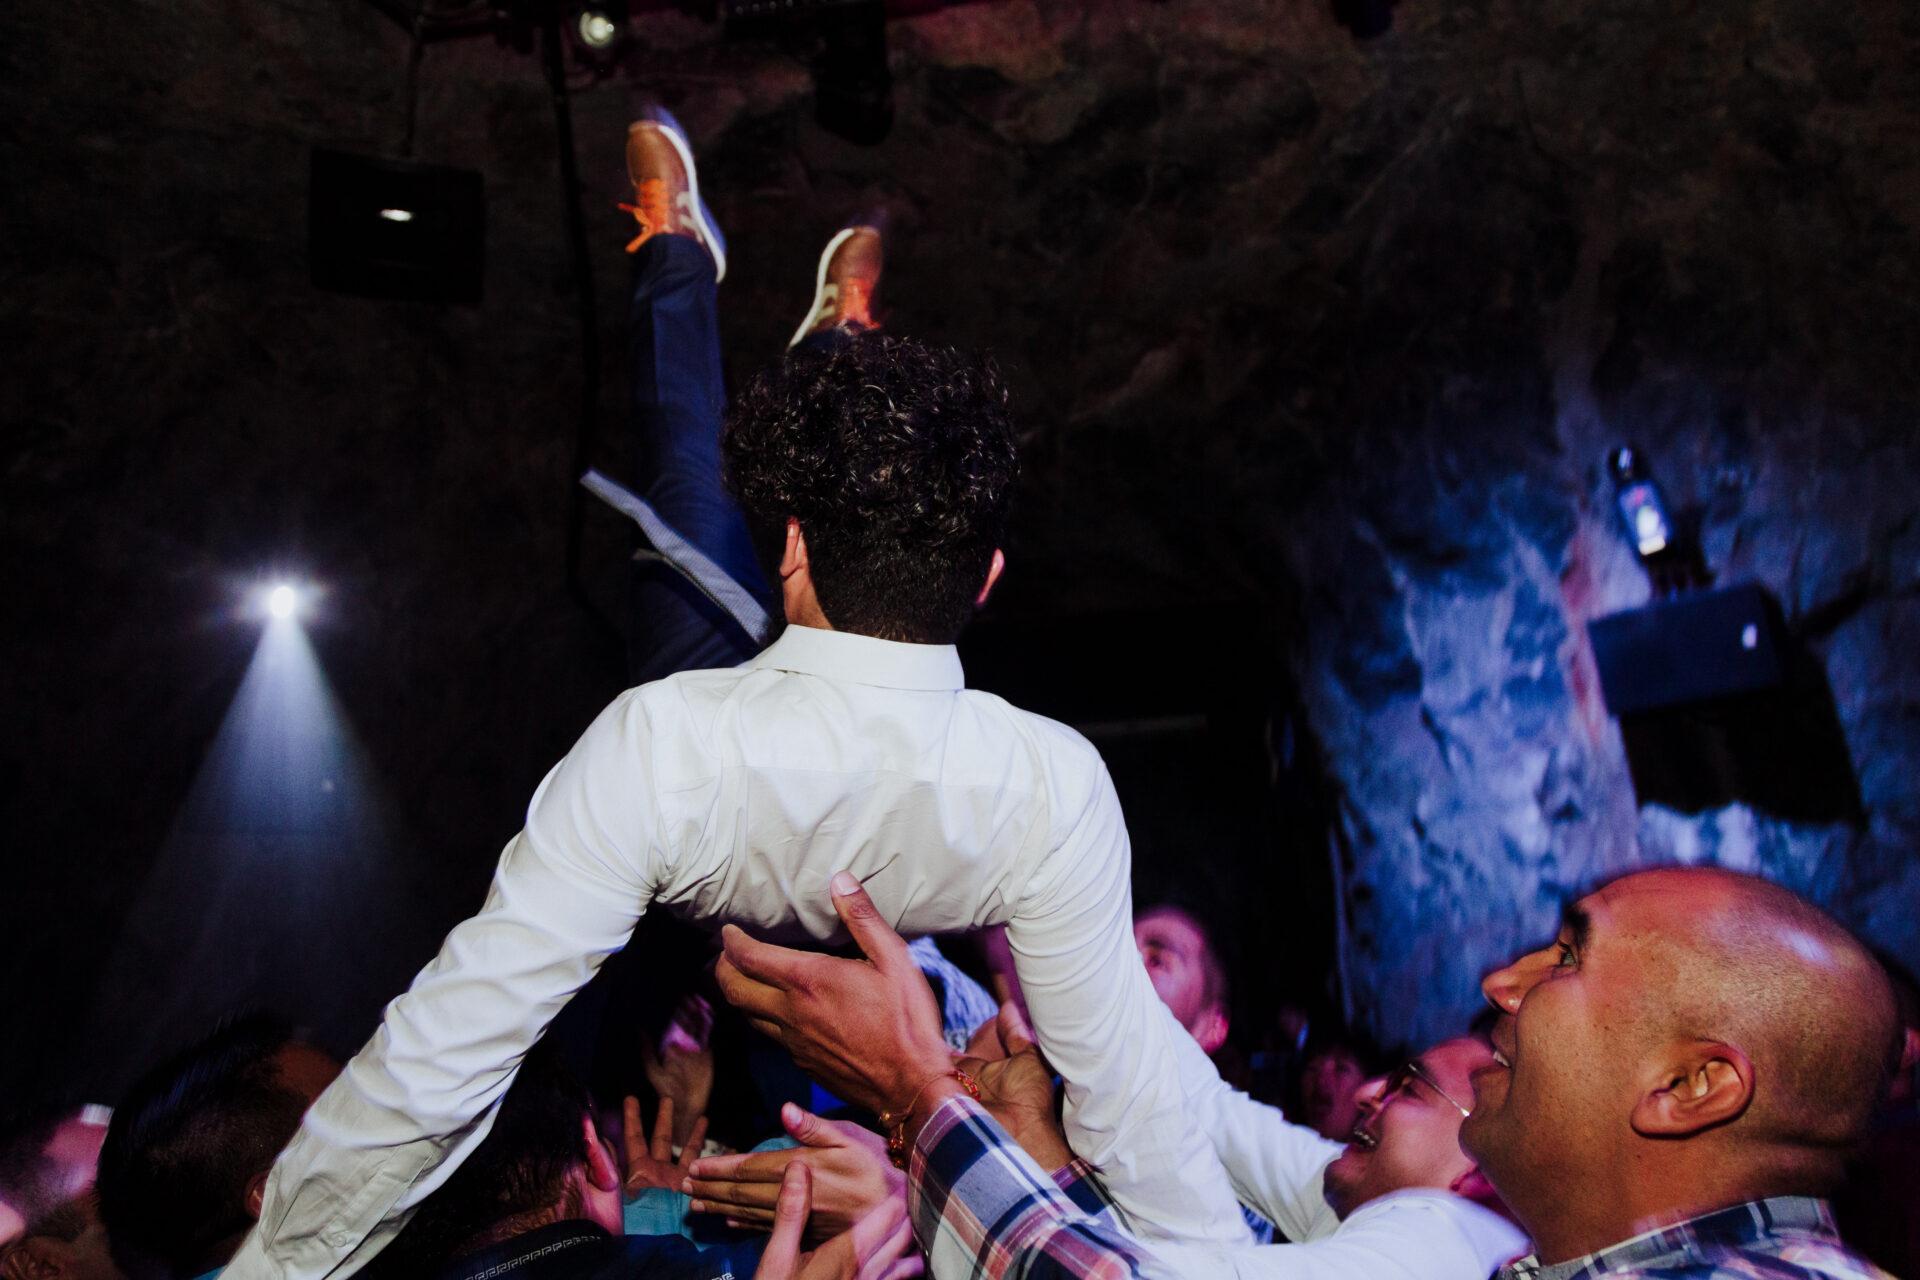 javier_noriega_fotografo_bodas_la_mina_club_zacatecas_wedding_photographer30